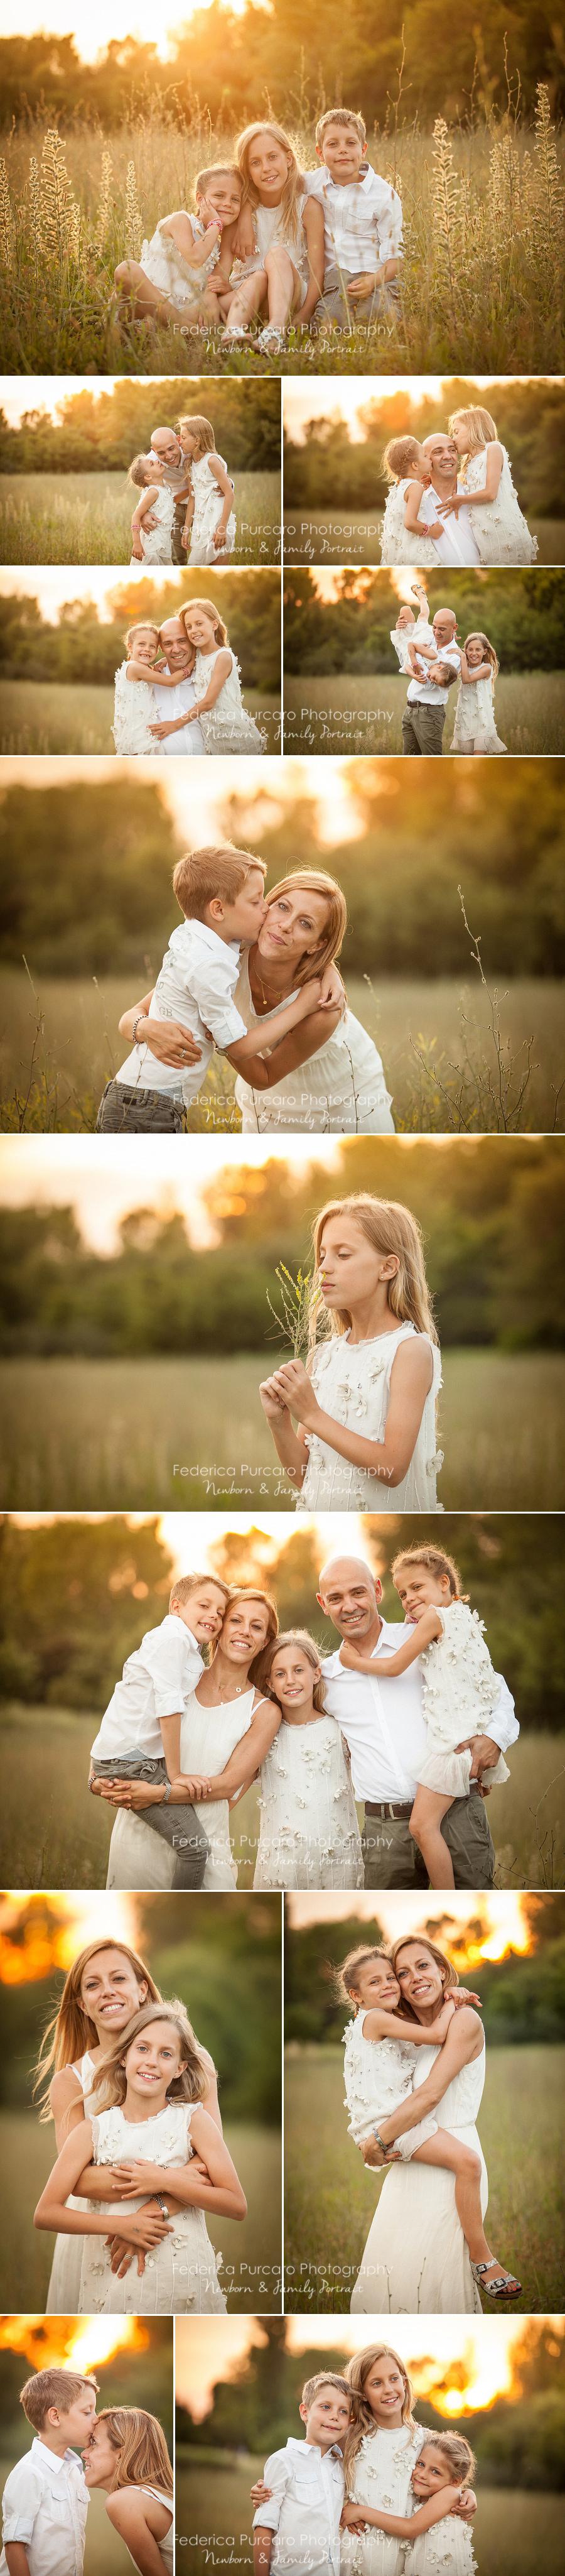 federica purcaro - fotografo bambini modena 1